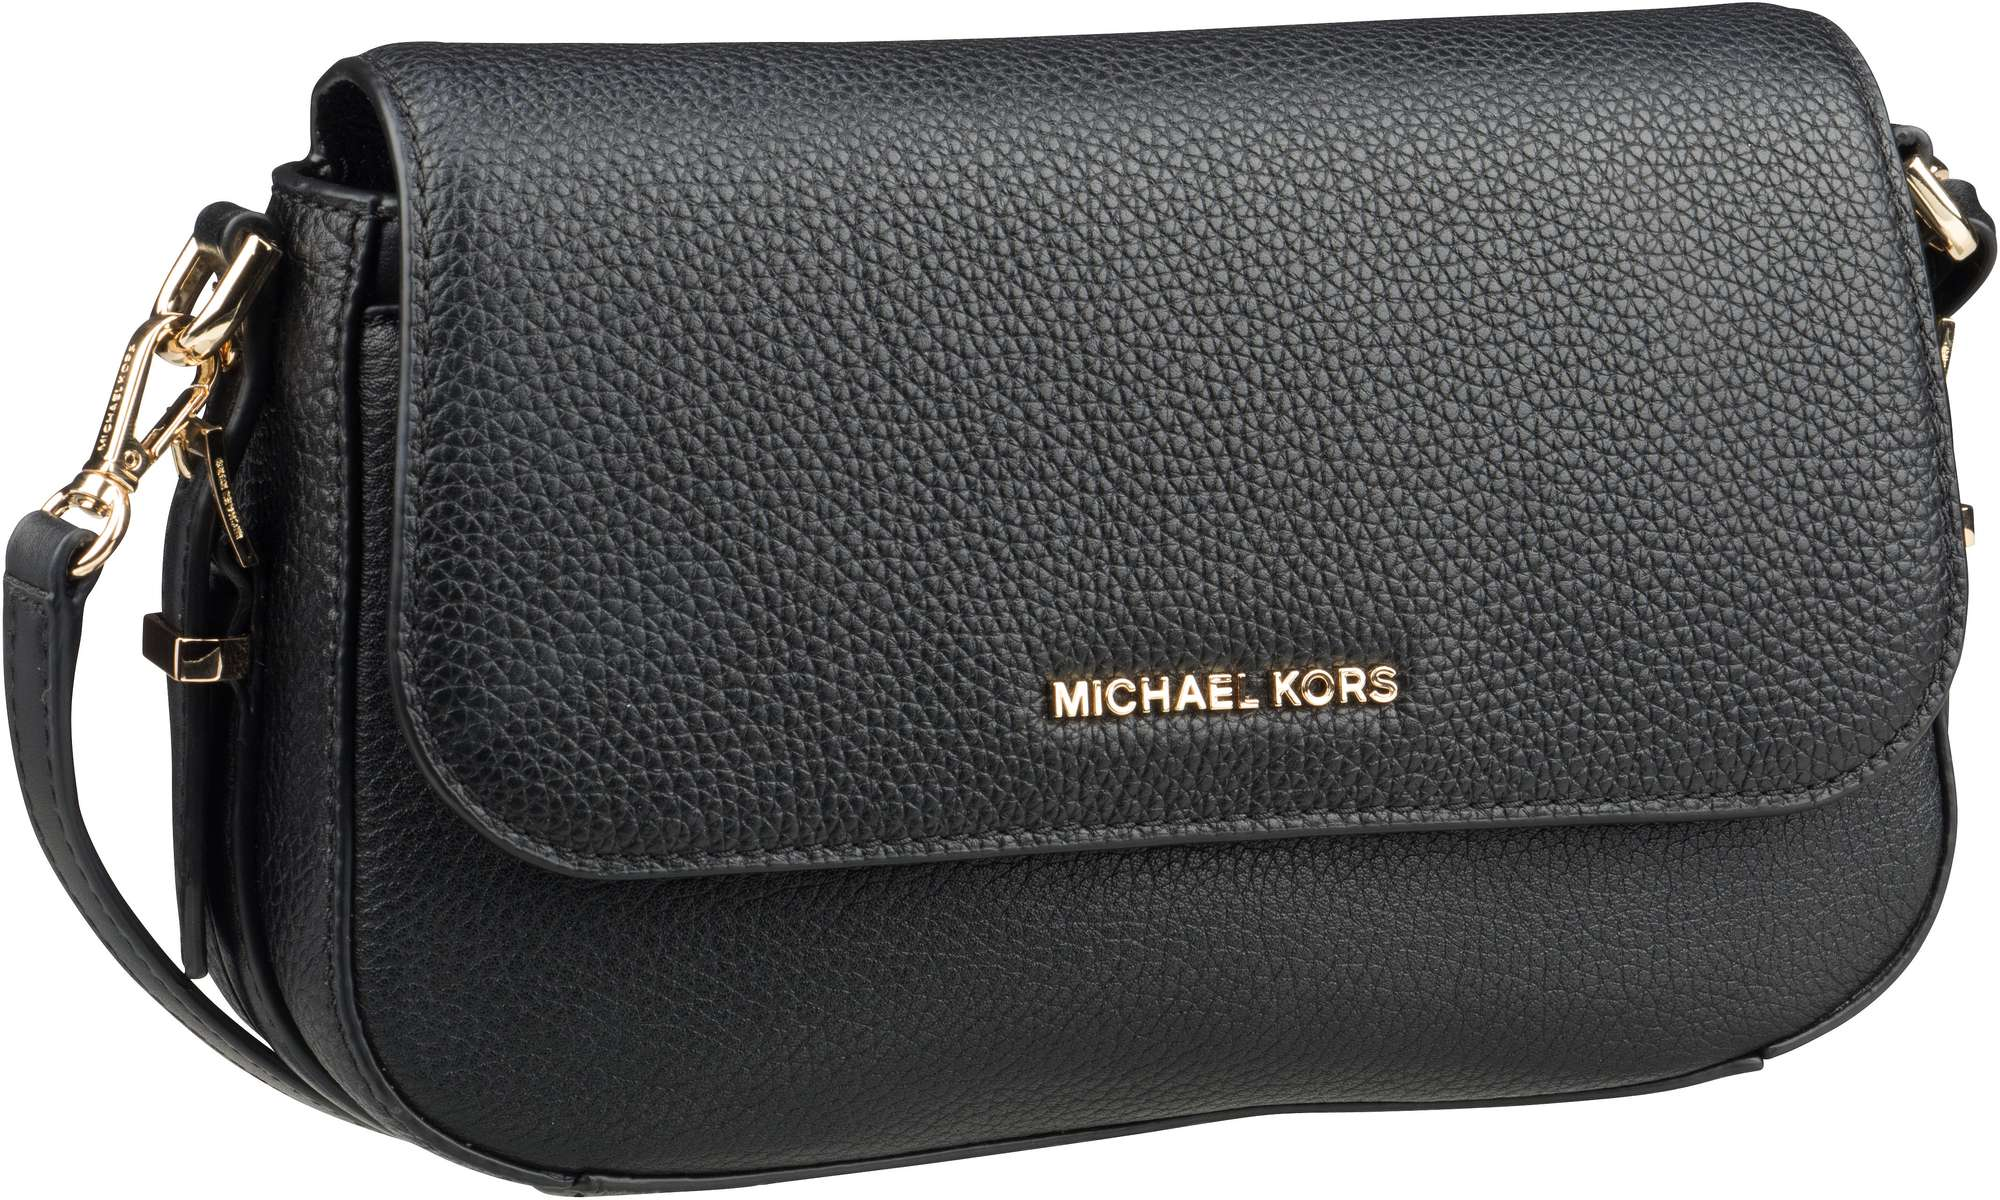 Michael Kors Umhängetasche Bedford Legacy Large Flap Xbody Black